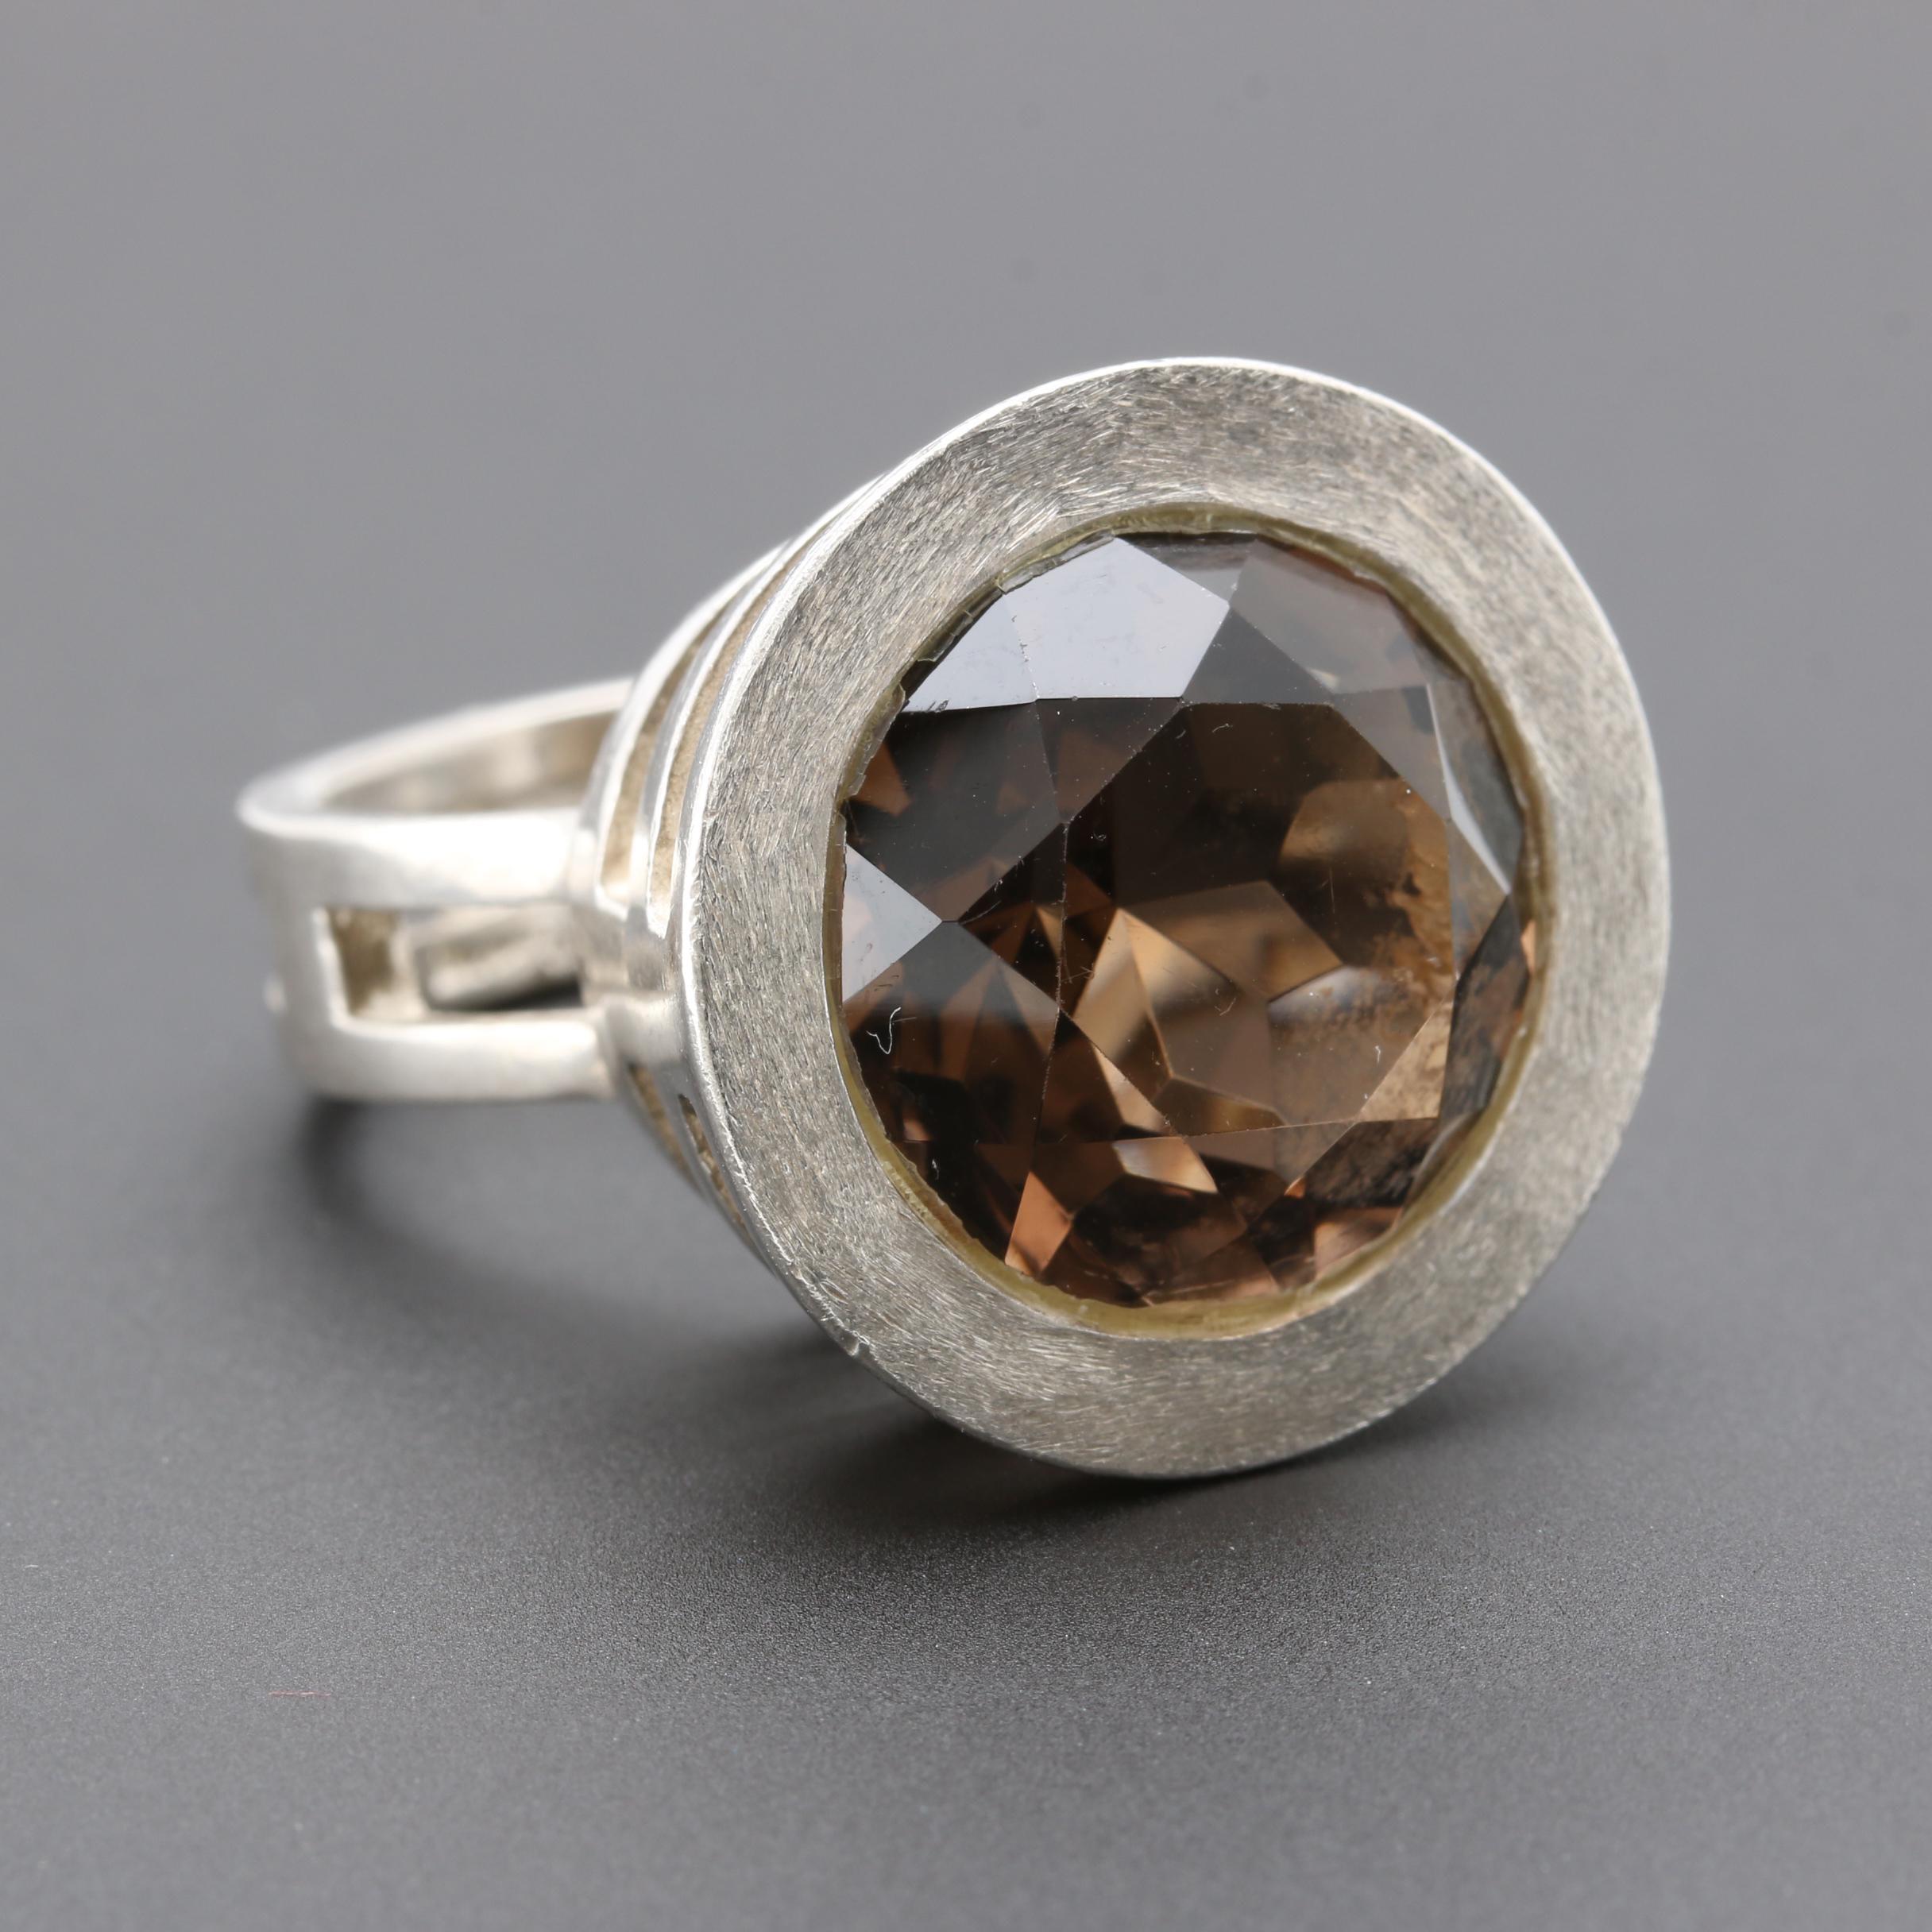 German Sterling Silver Smoky Quartz Ring